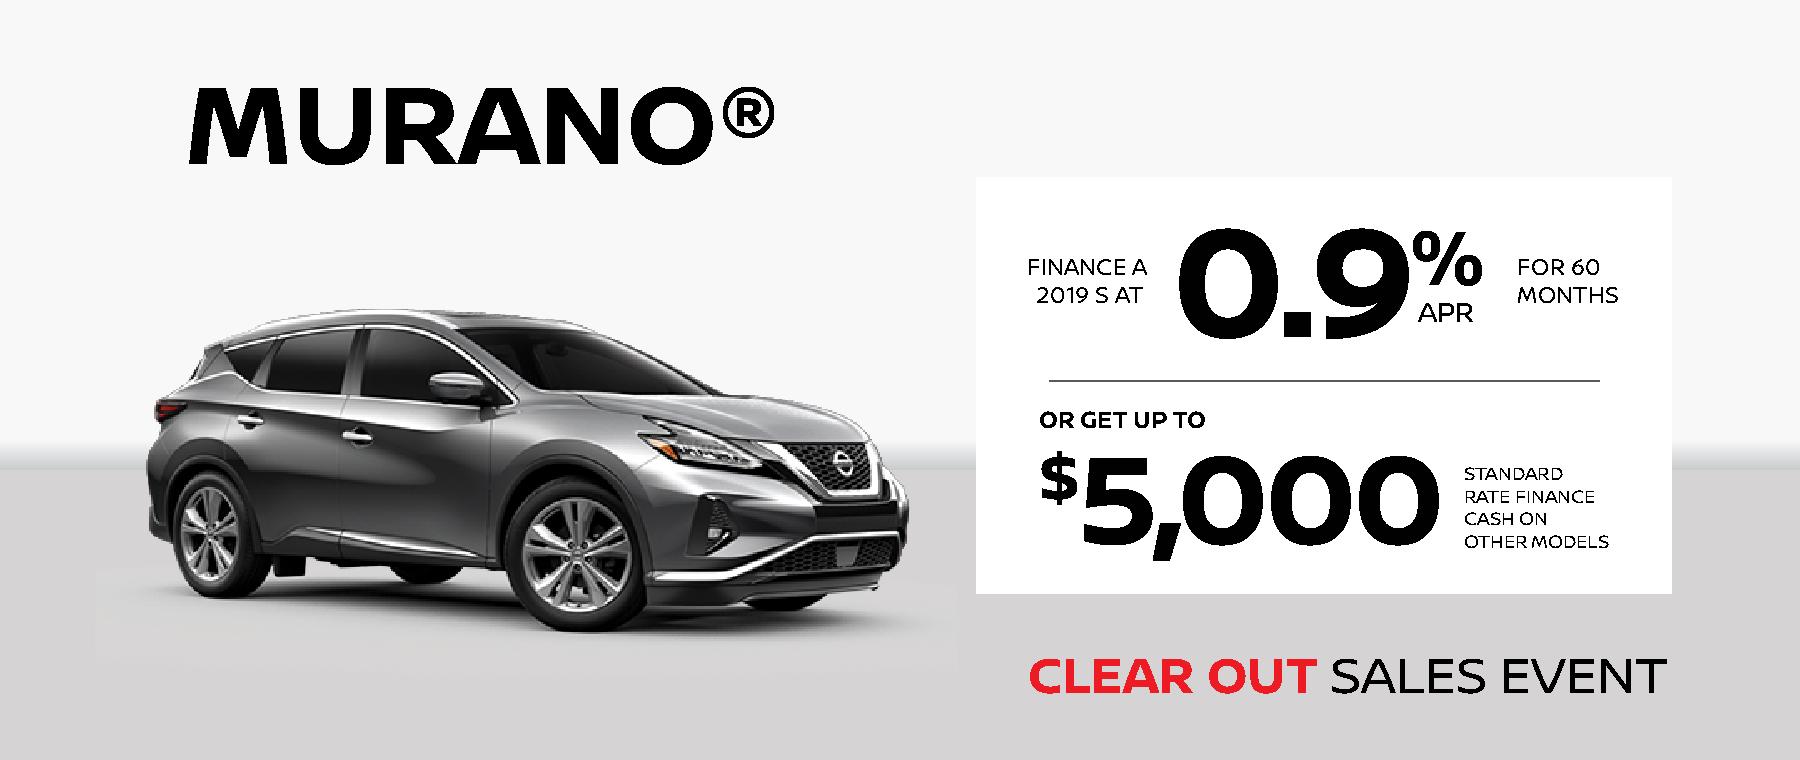 Nissan Murano Deal